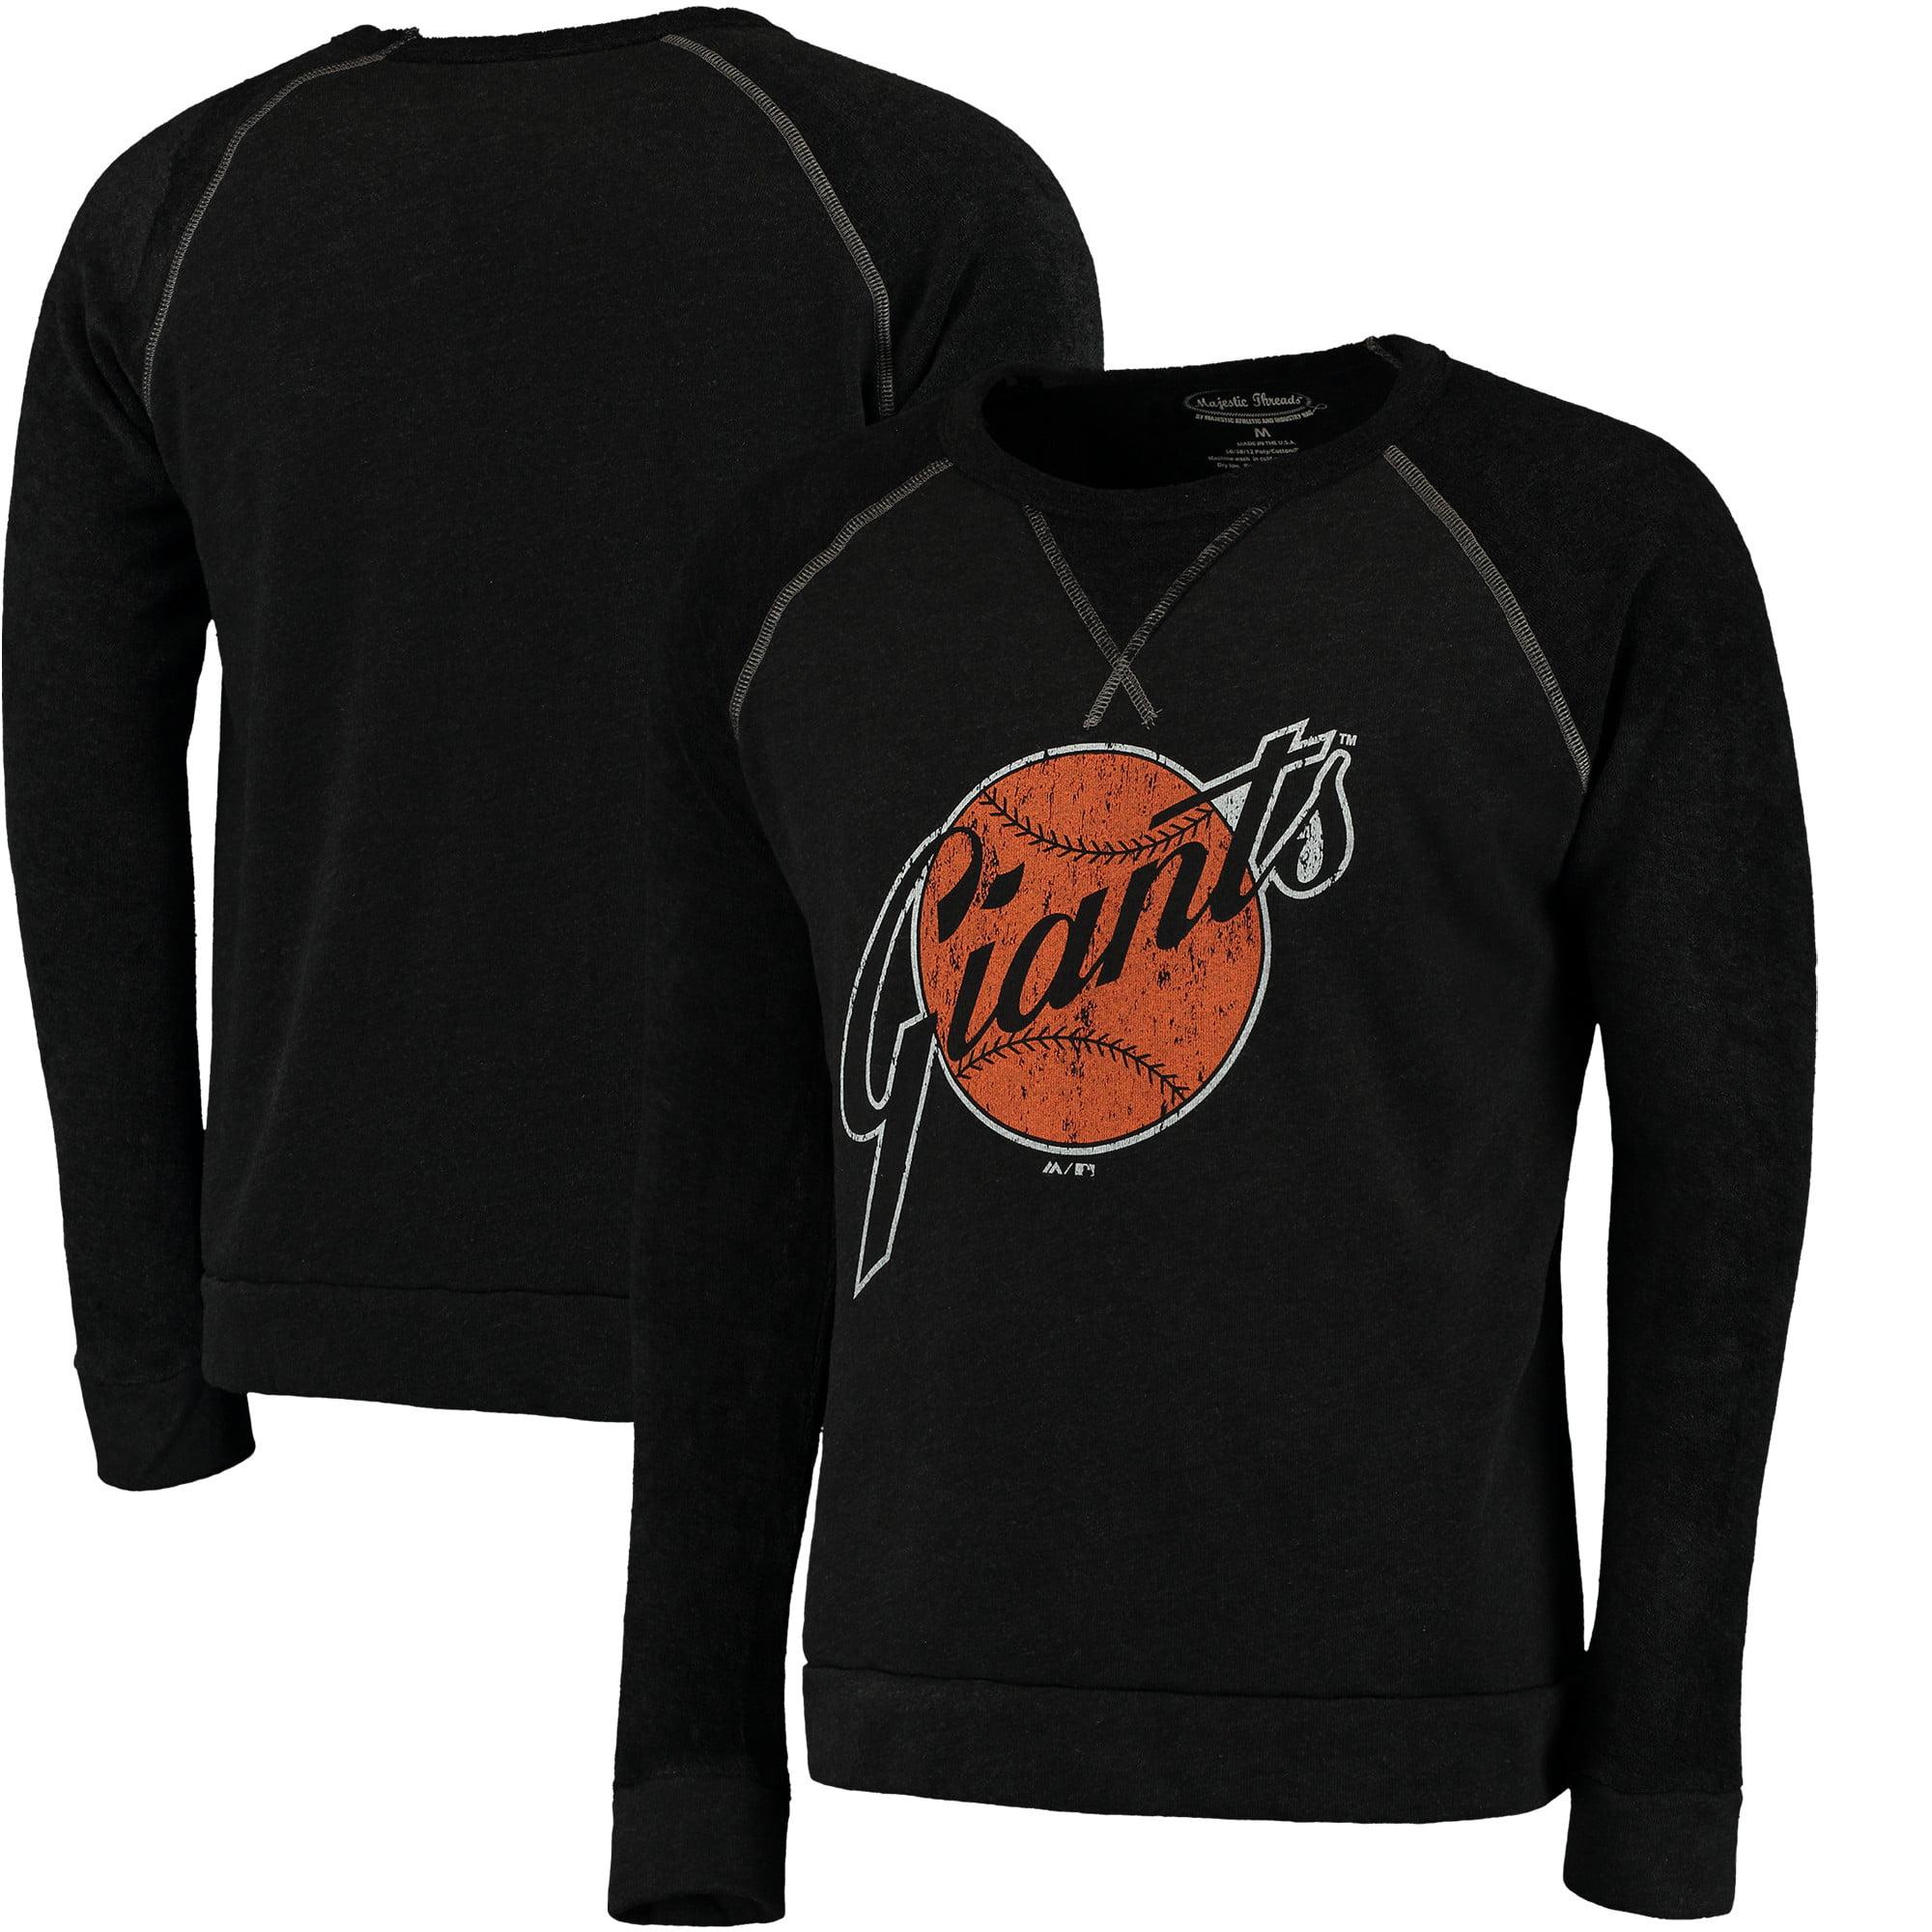 San Francisco Giants Majestic Threads Vintage Terry Crew Raglan Sweatshirt - Black